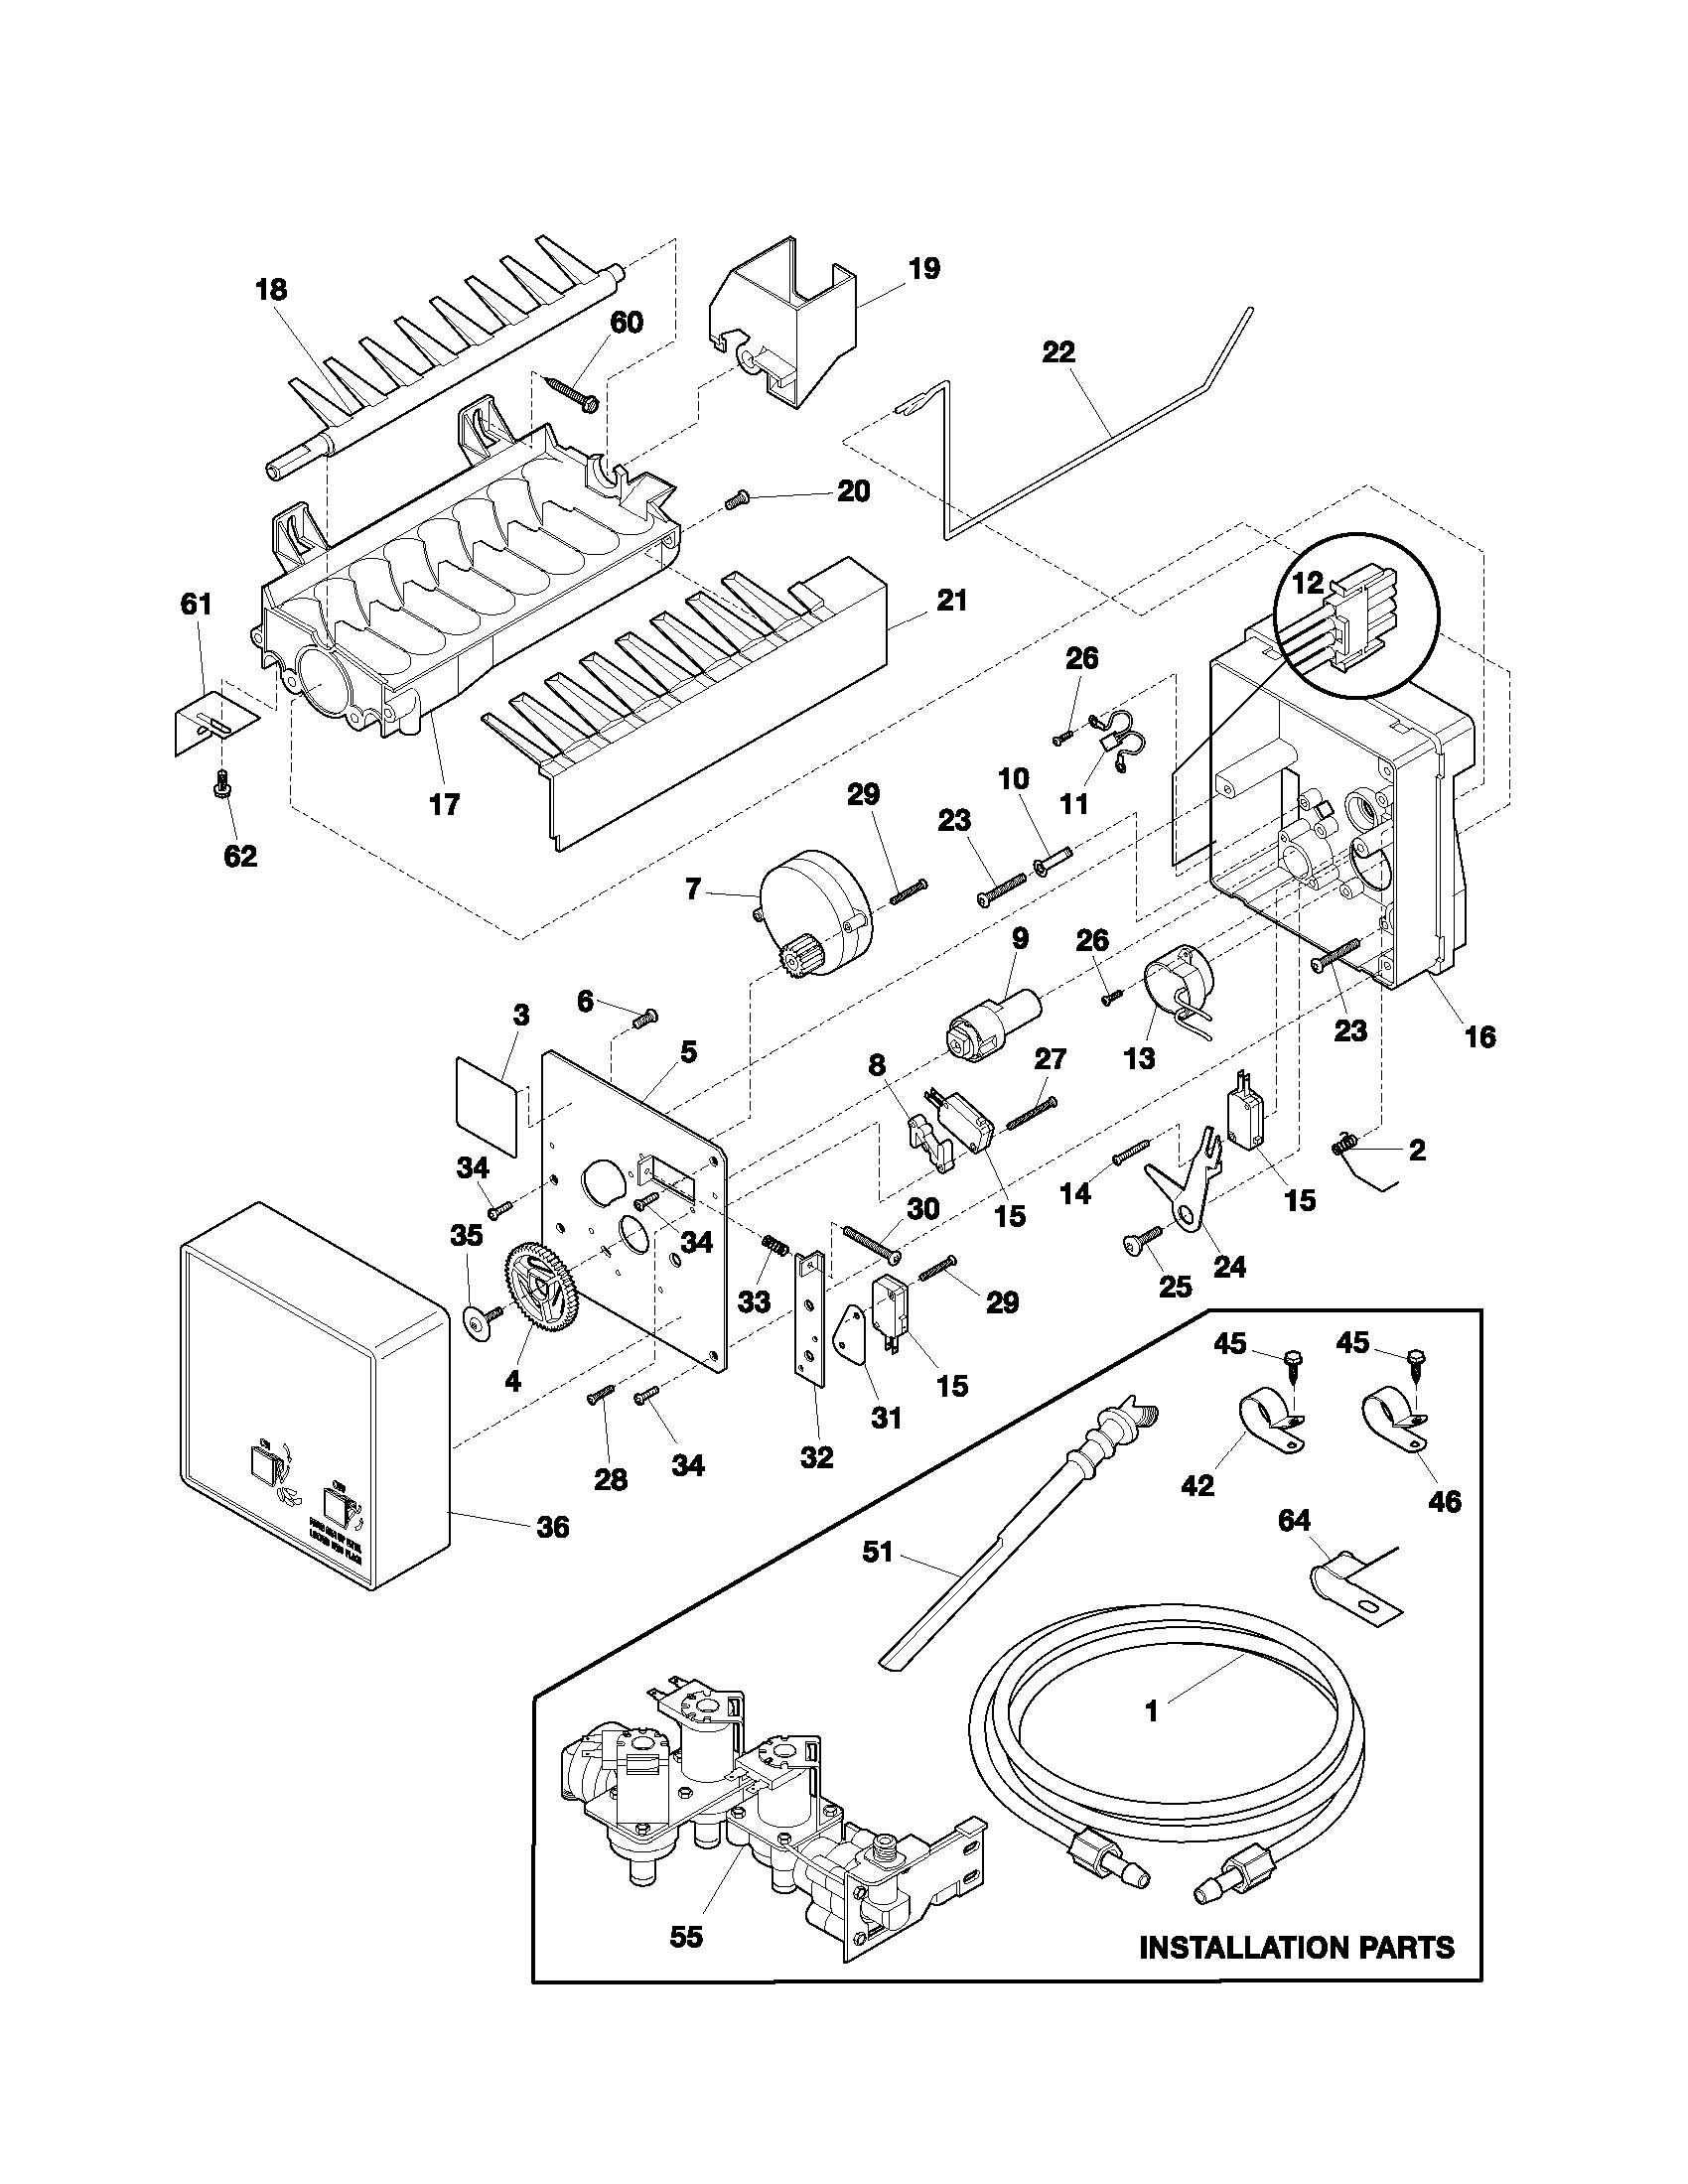 Frigidaire Gallery Refrigerator Parts Diagram Frigidaire Model Frs26rlecs0 Side by Side Refrigerator Genuine Parts Of Frigidaire Gallery Refrigerator Parts Diagram